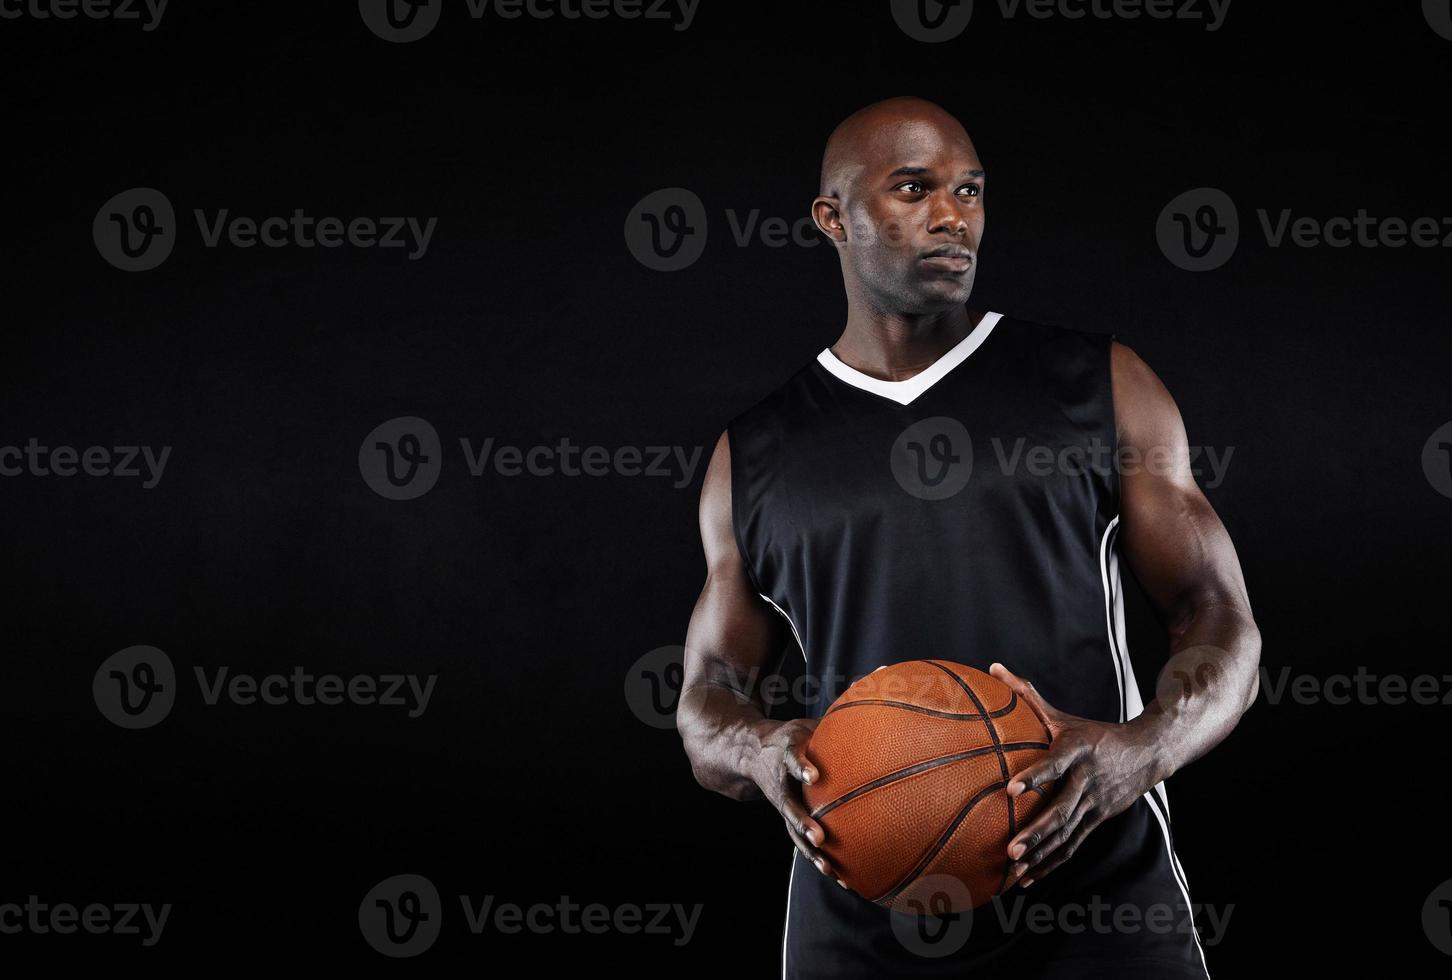 gespierde basketbalspeler op zwarte achtergrond foto